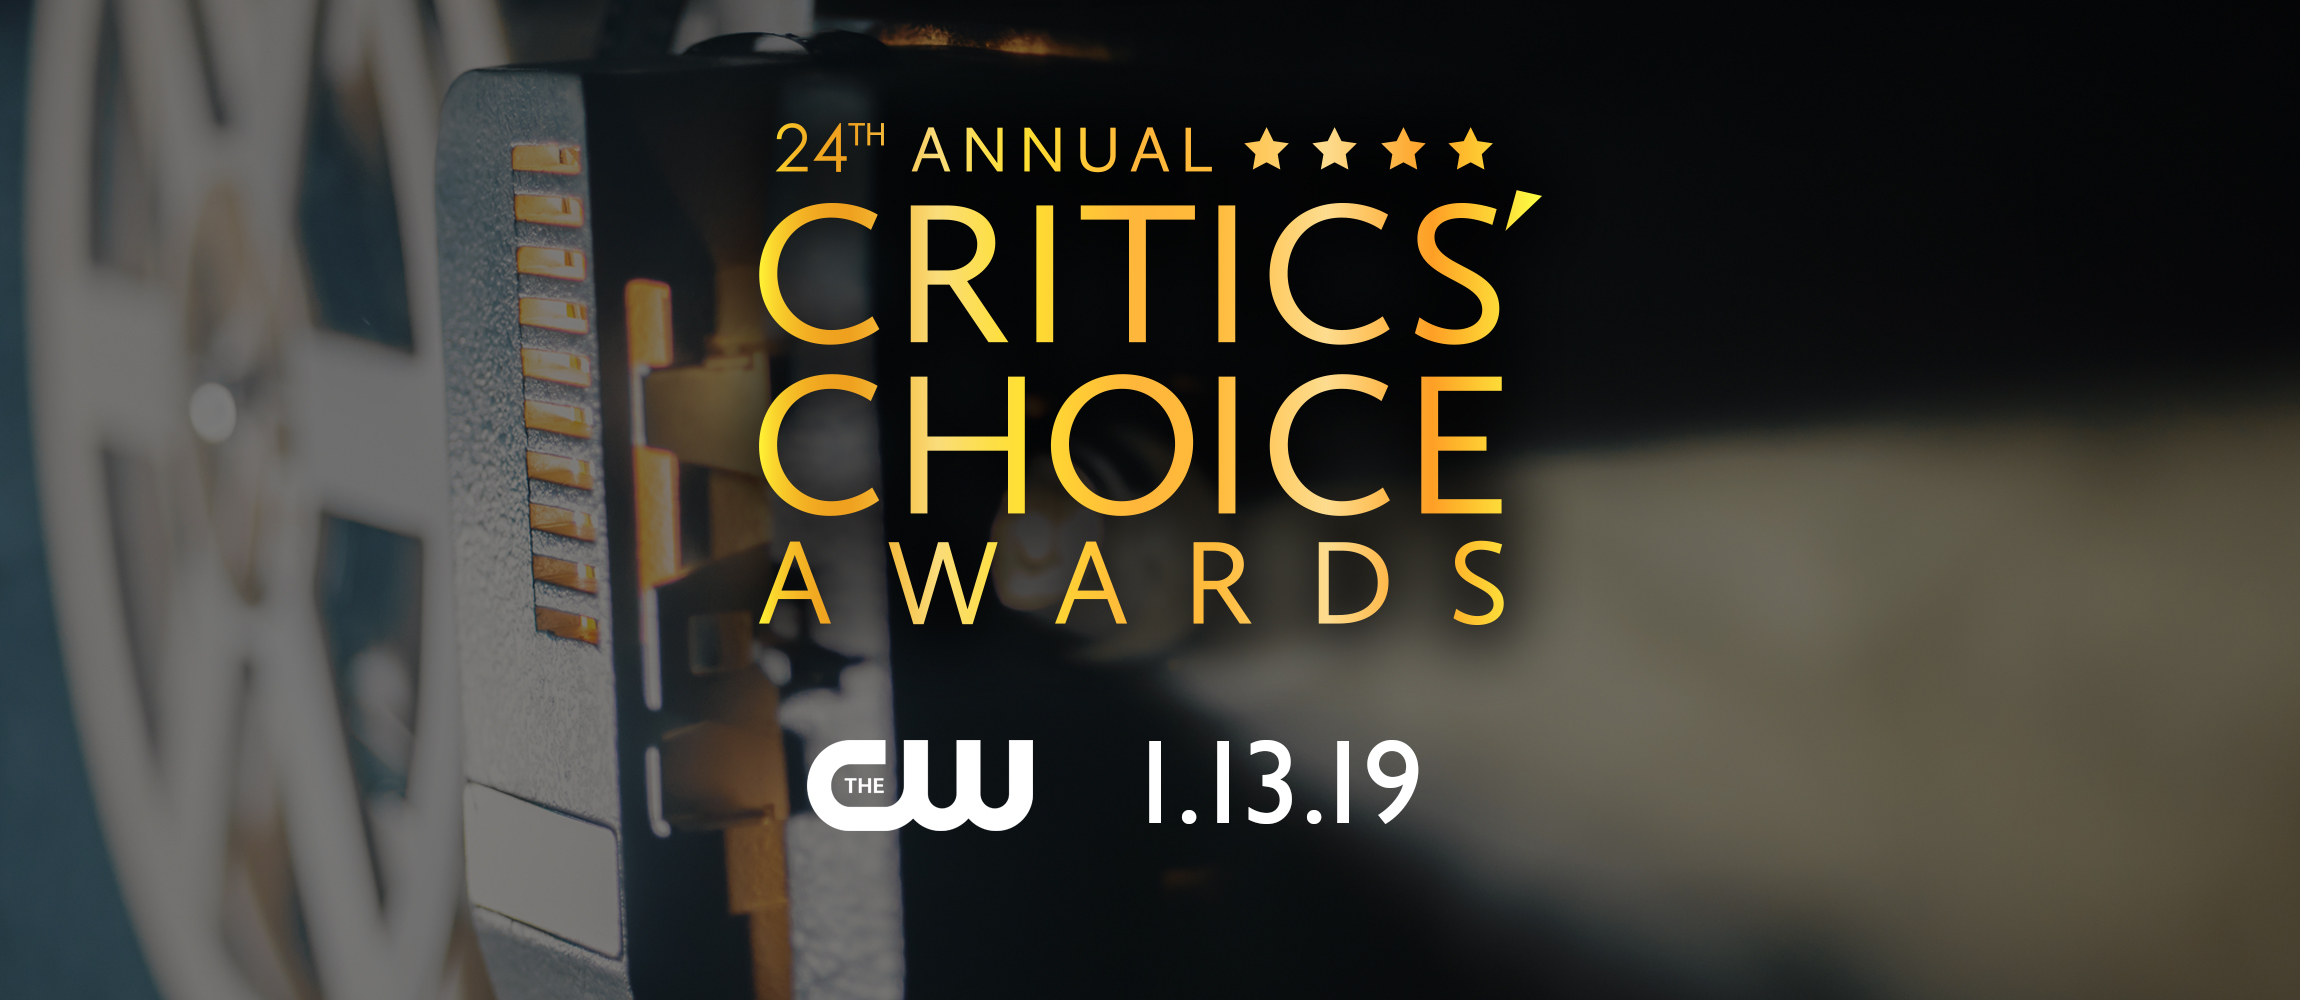 criticschoice2019-site.jpg